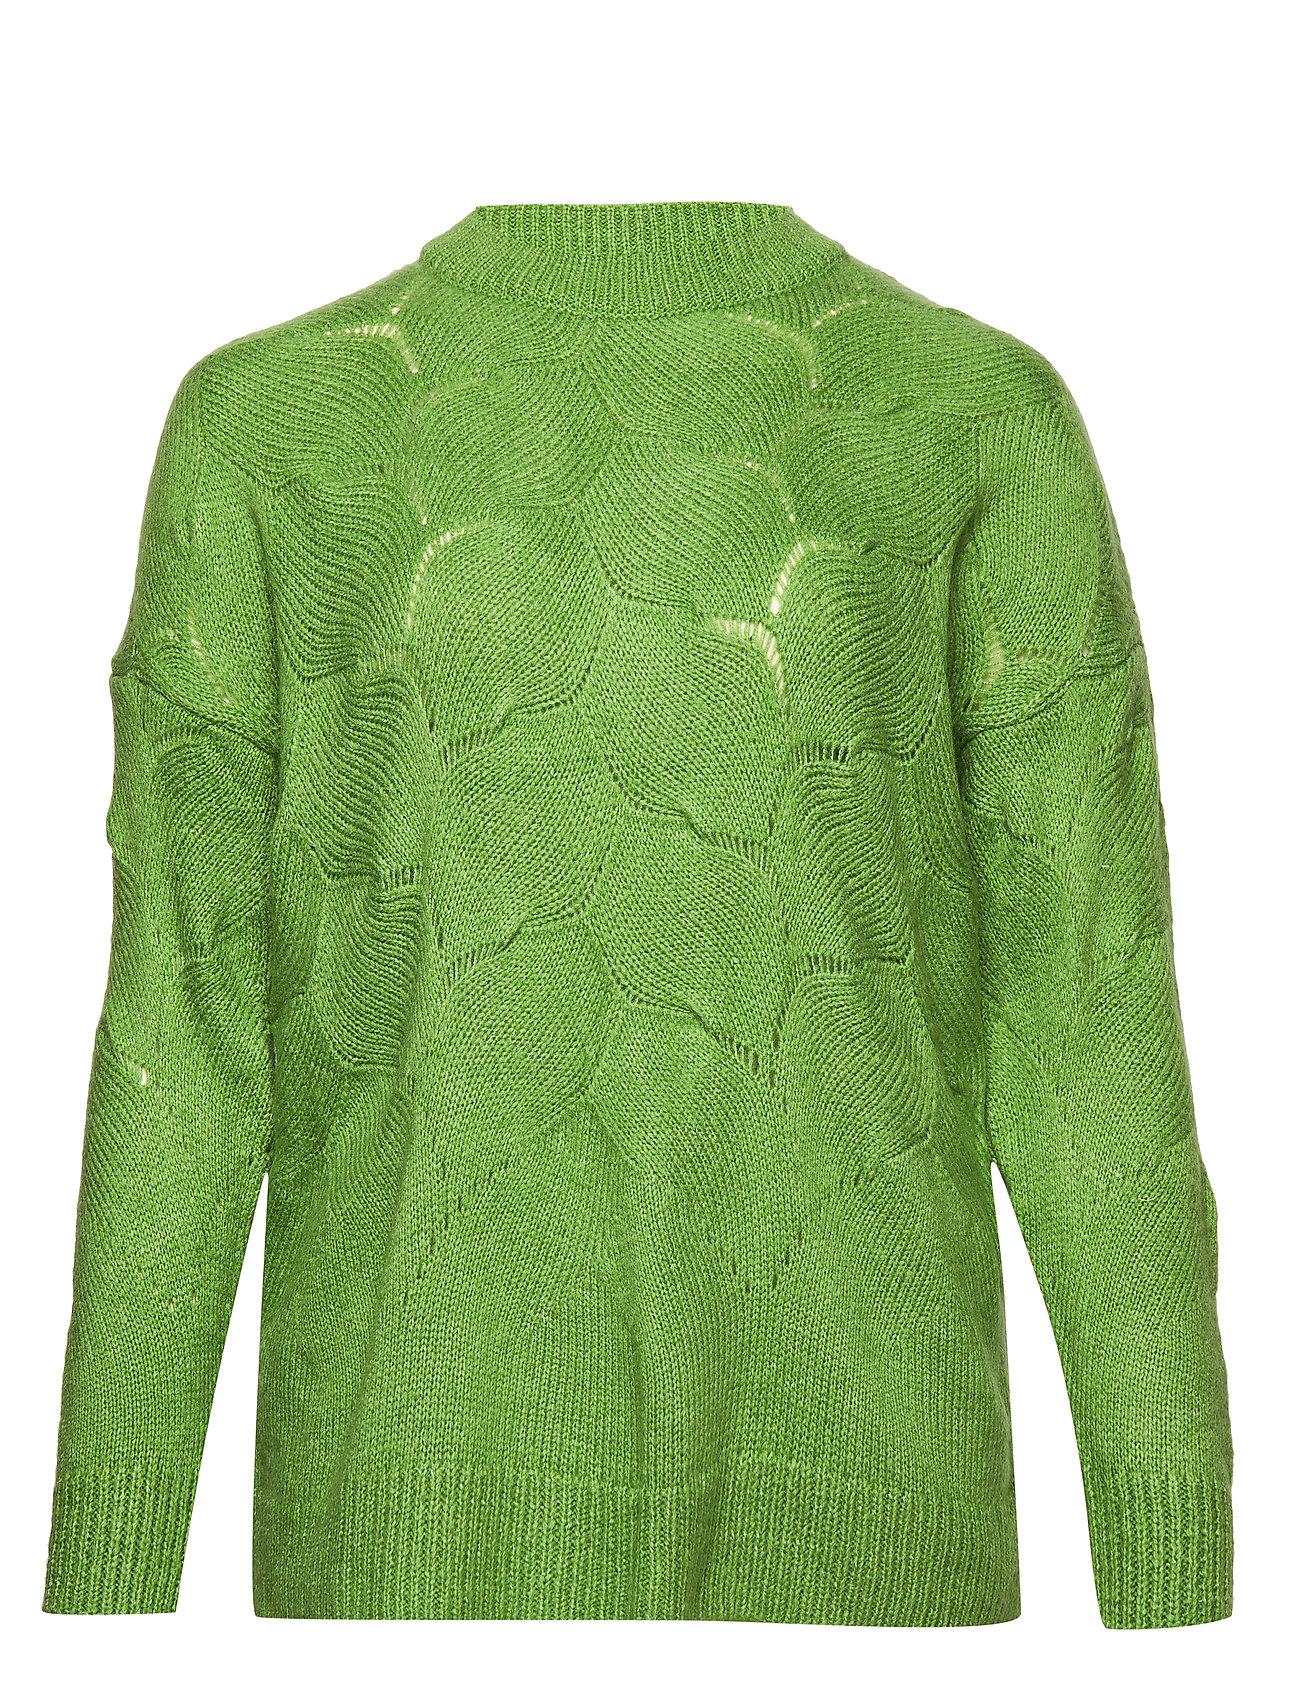 Violeta by Mango Openwork knit sweater - GREEN